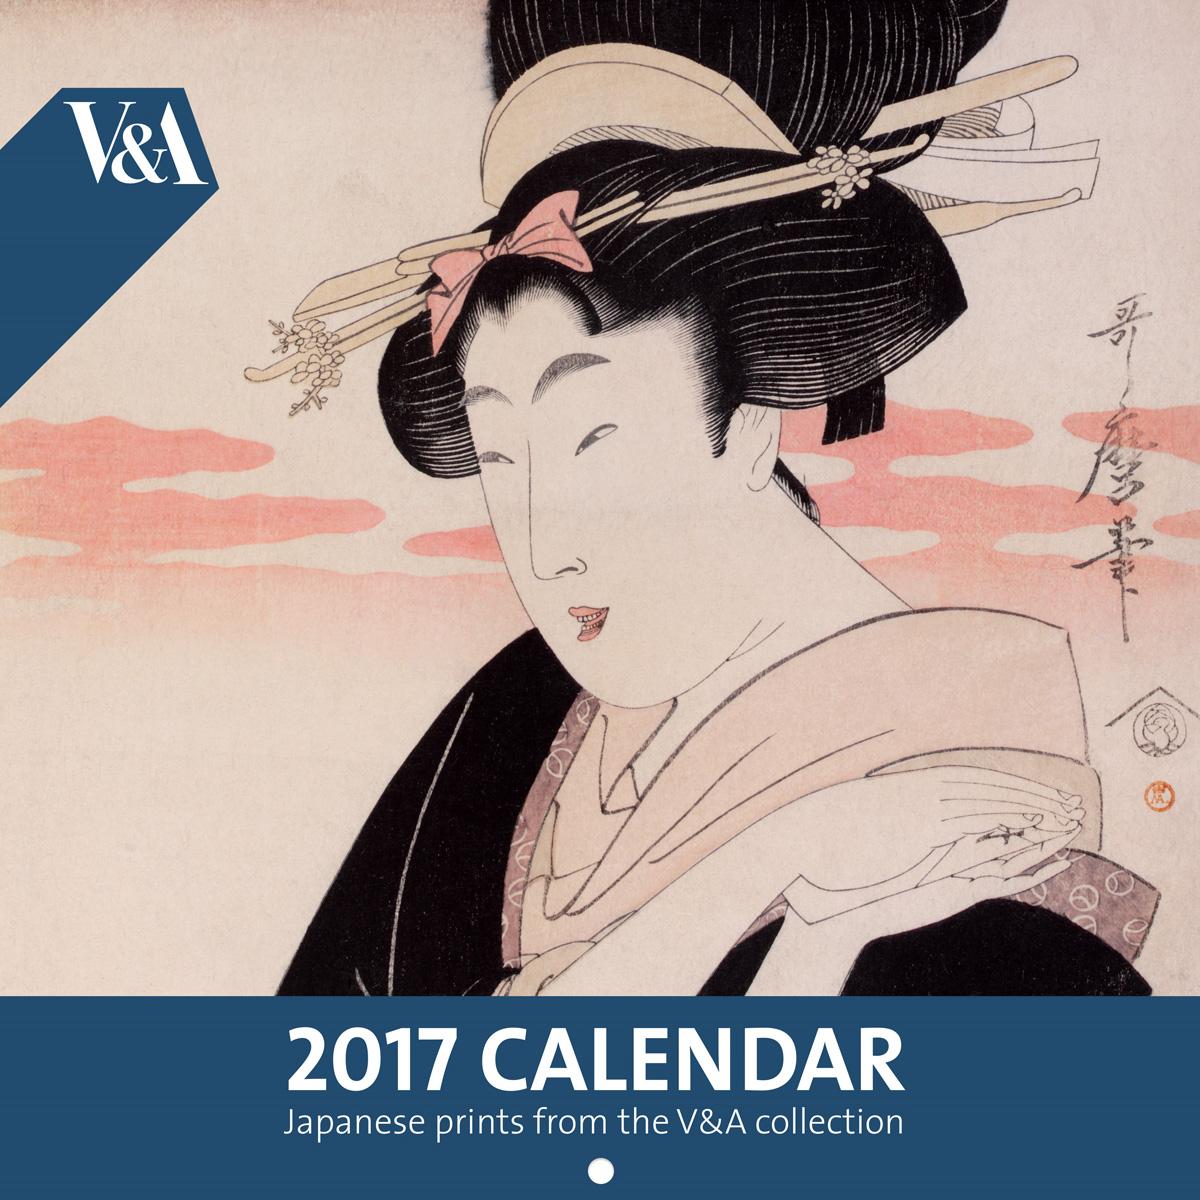 V&A Japan Calendar 2017